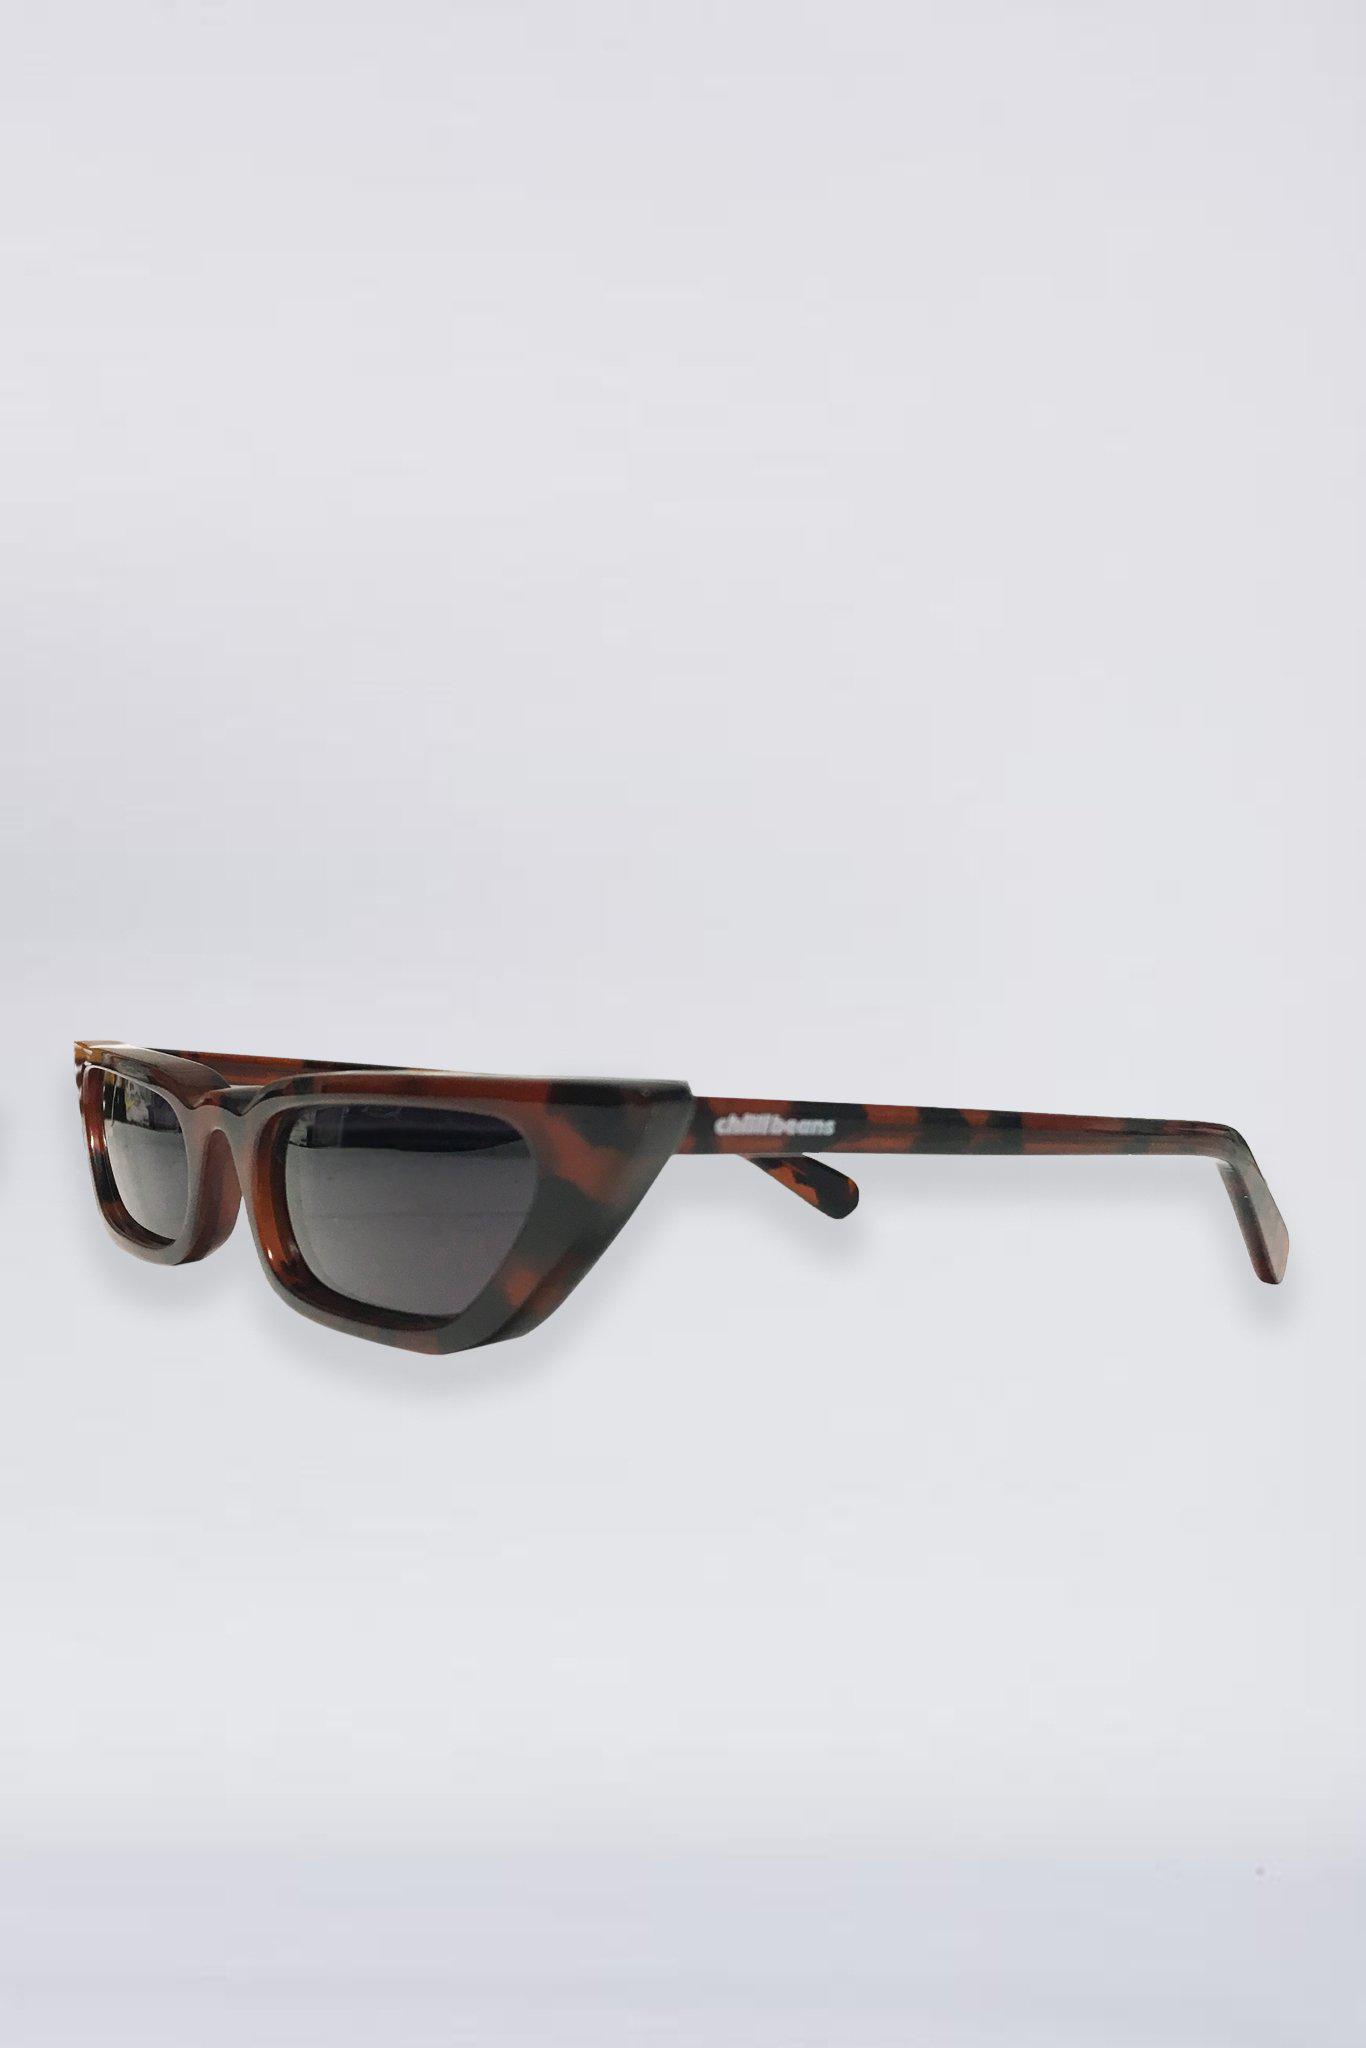 3d96b8159c Lyst - Haight Tortoise Sunglasses